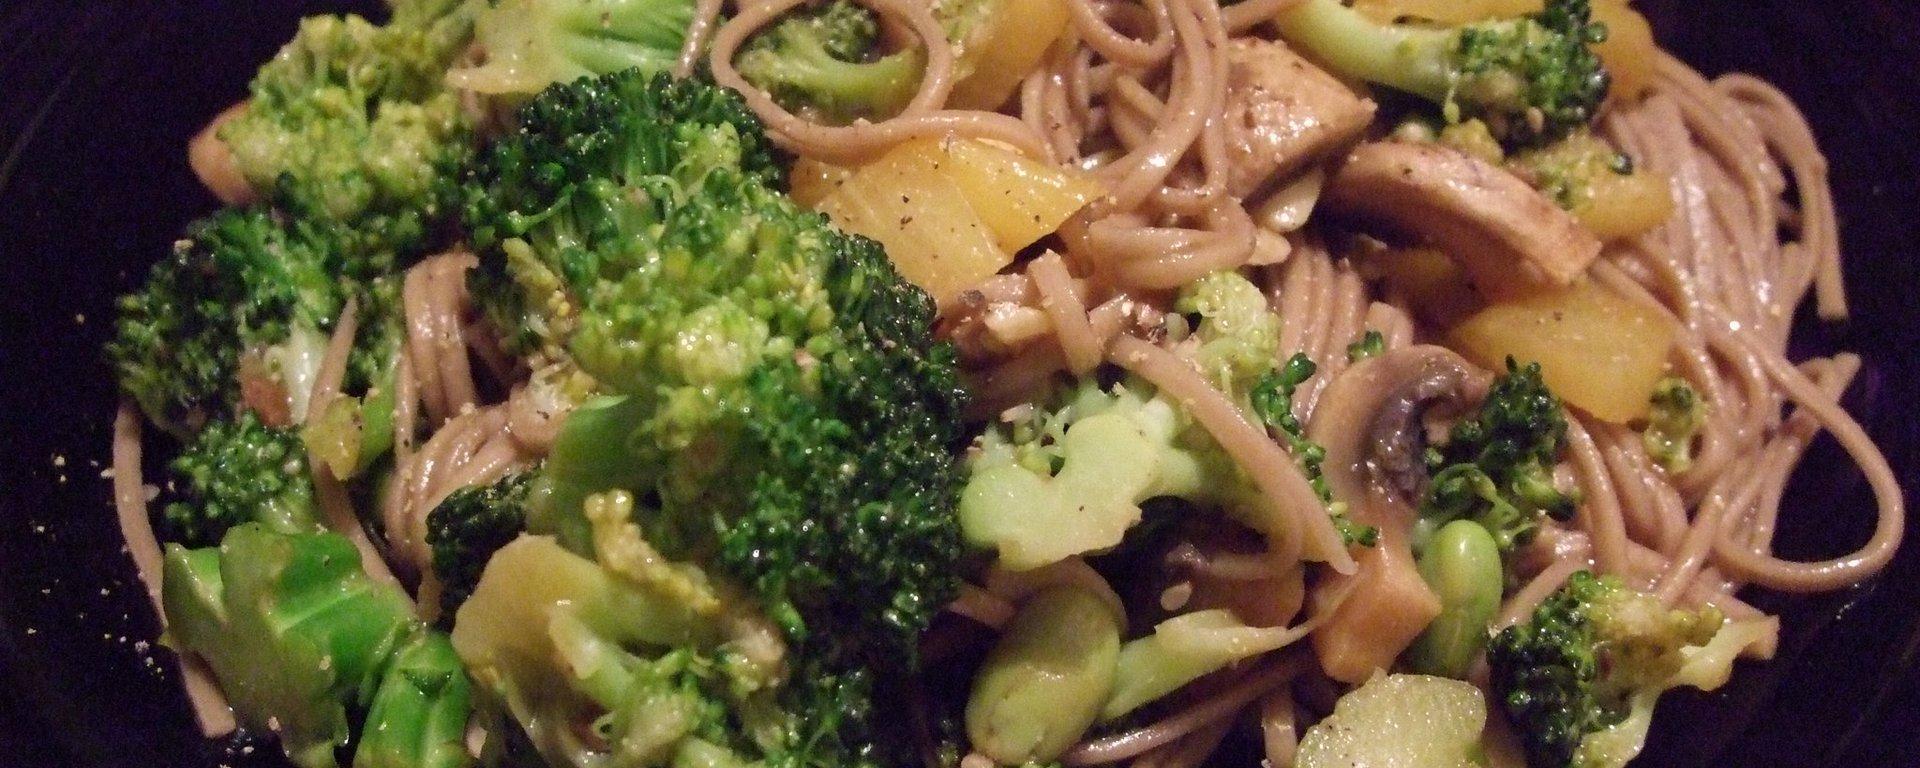 Mushroom broccoli noodle stir fry